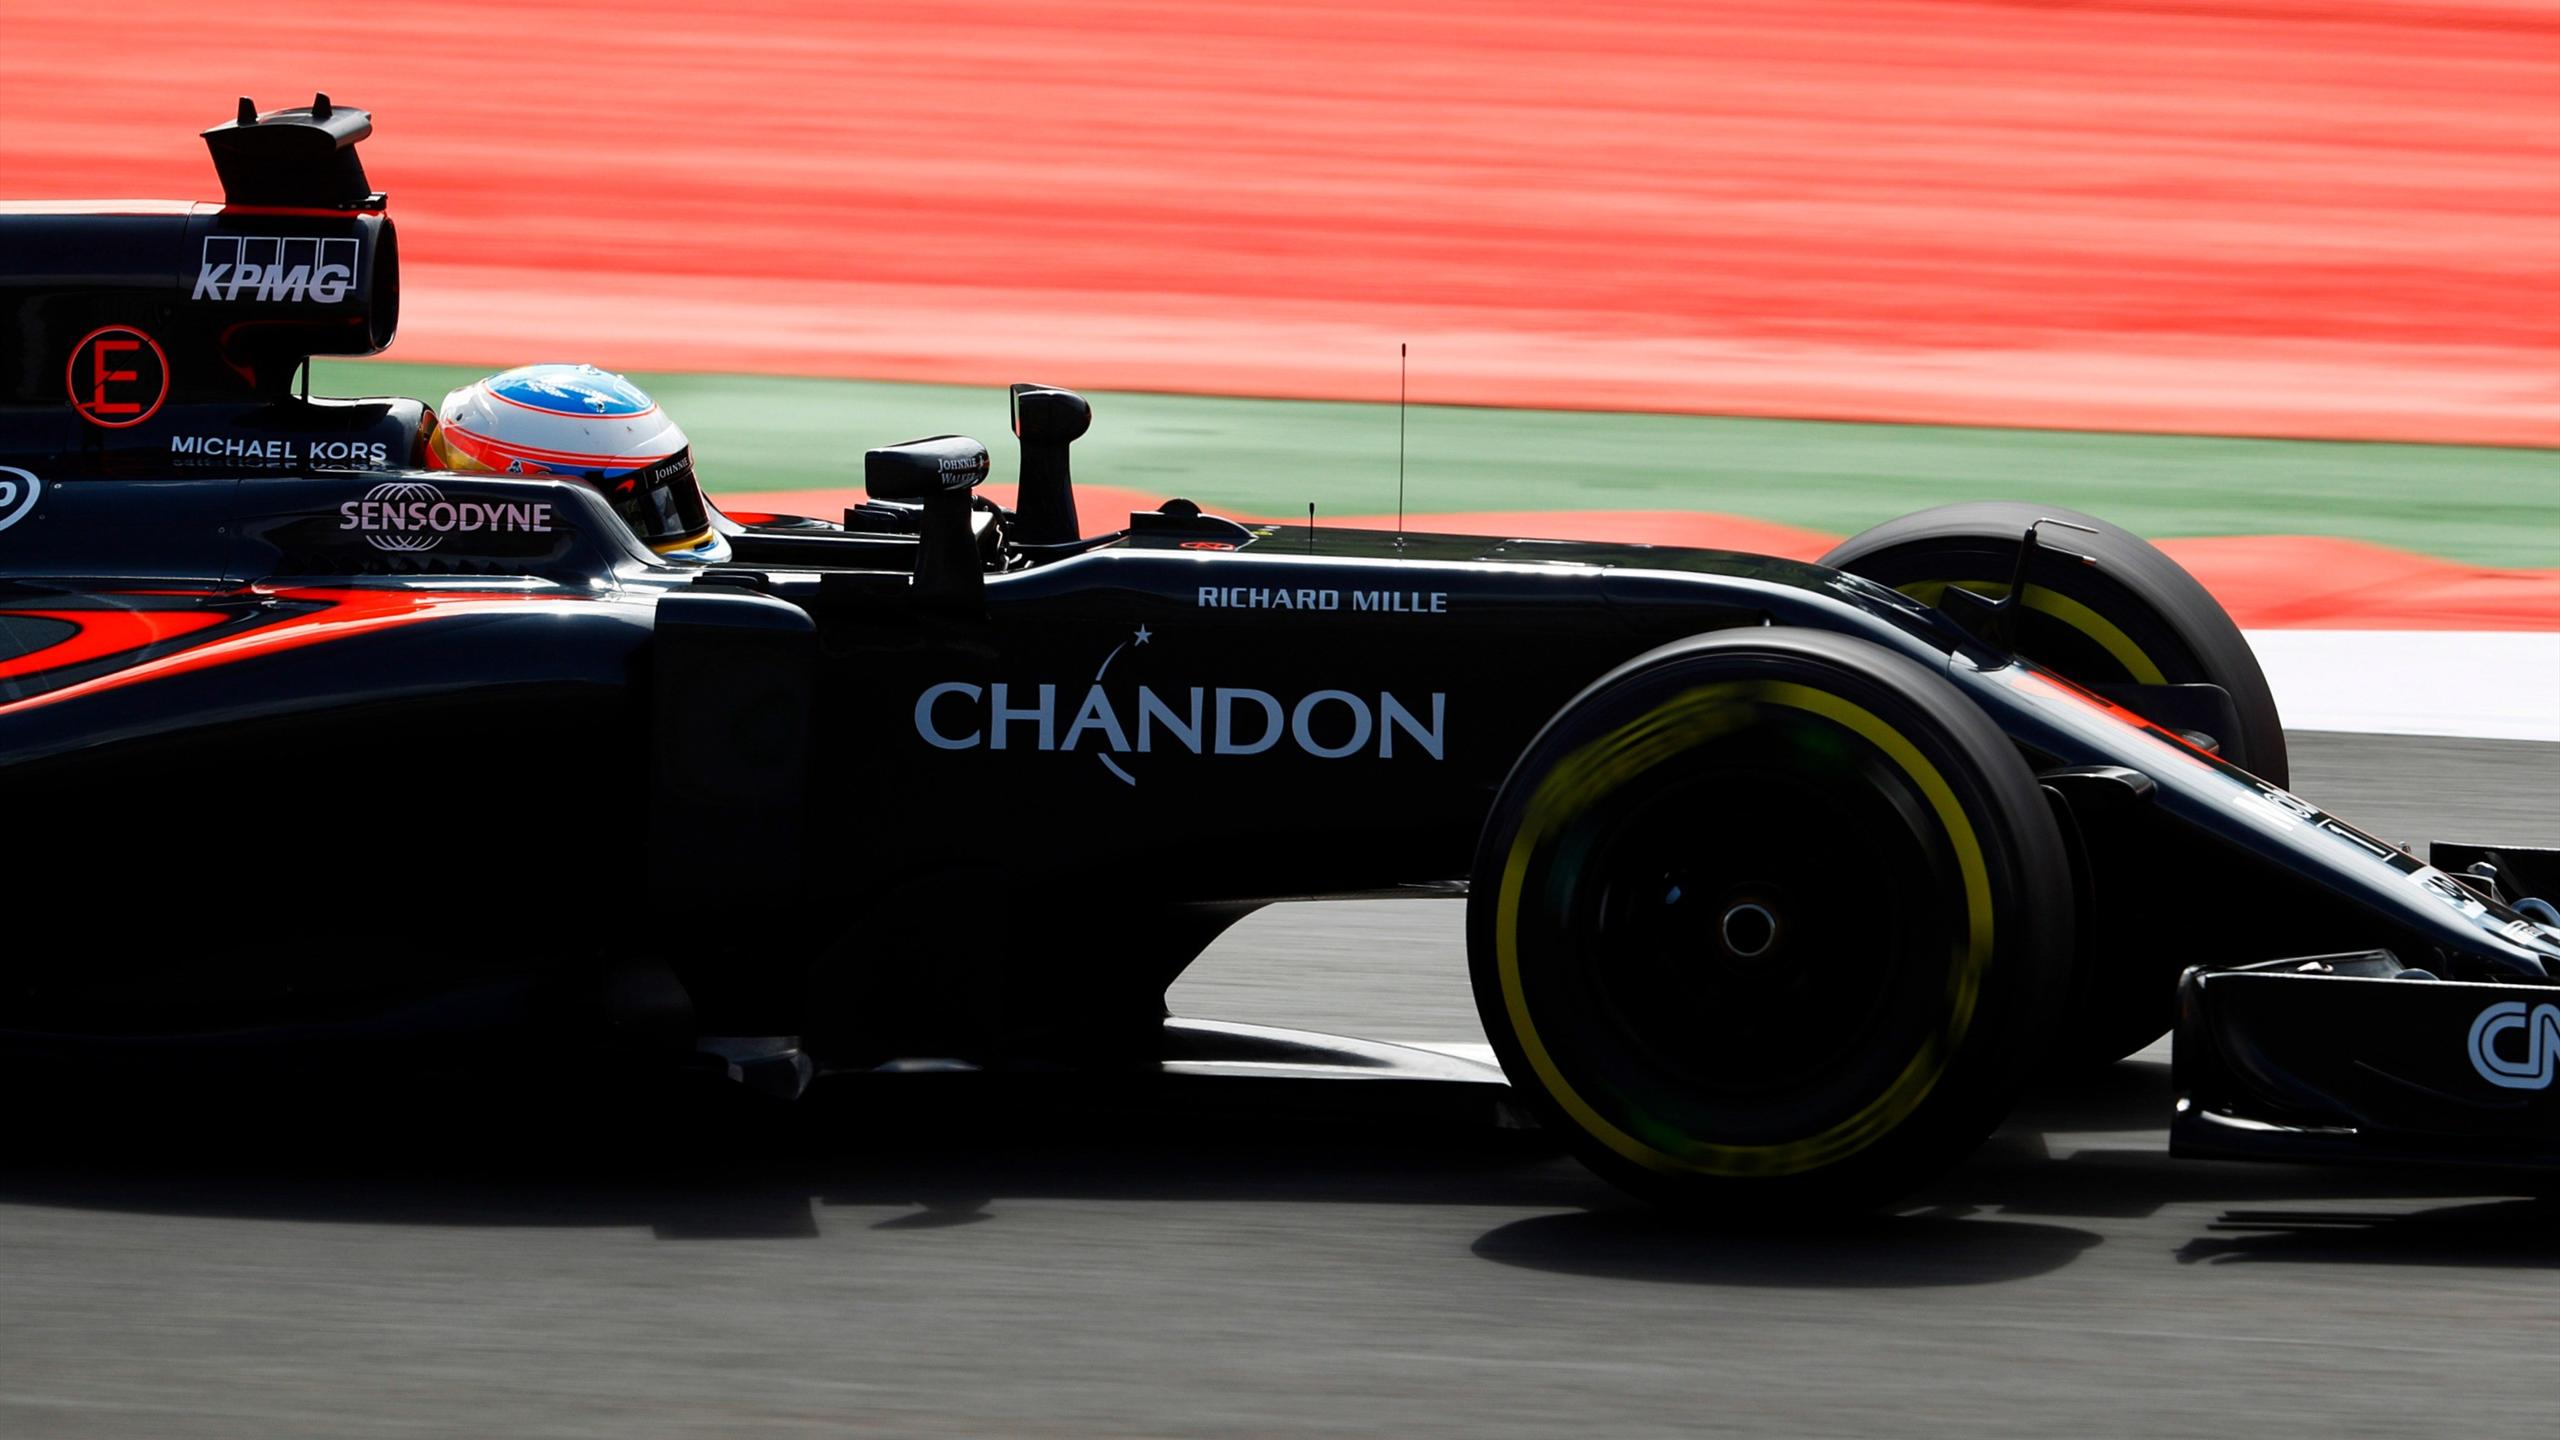 Fernando Alonso (McLaren) au Grand Prix d'Autriche 2016